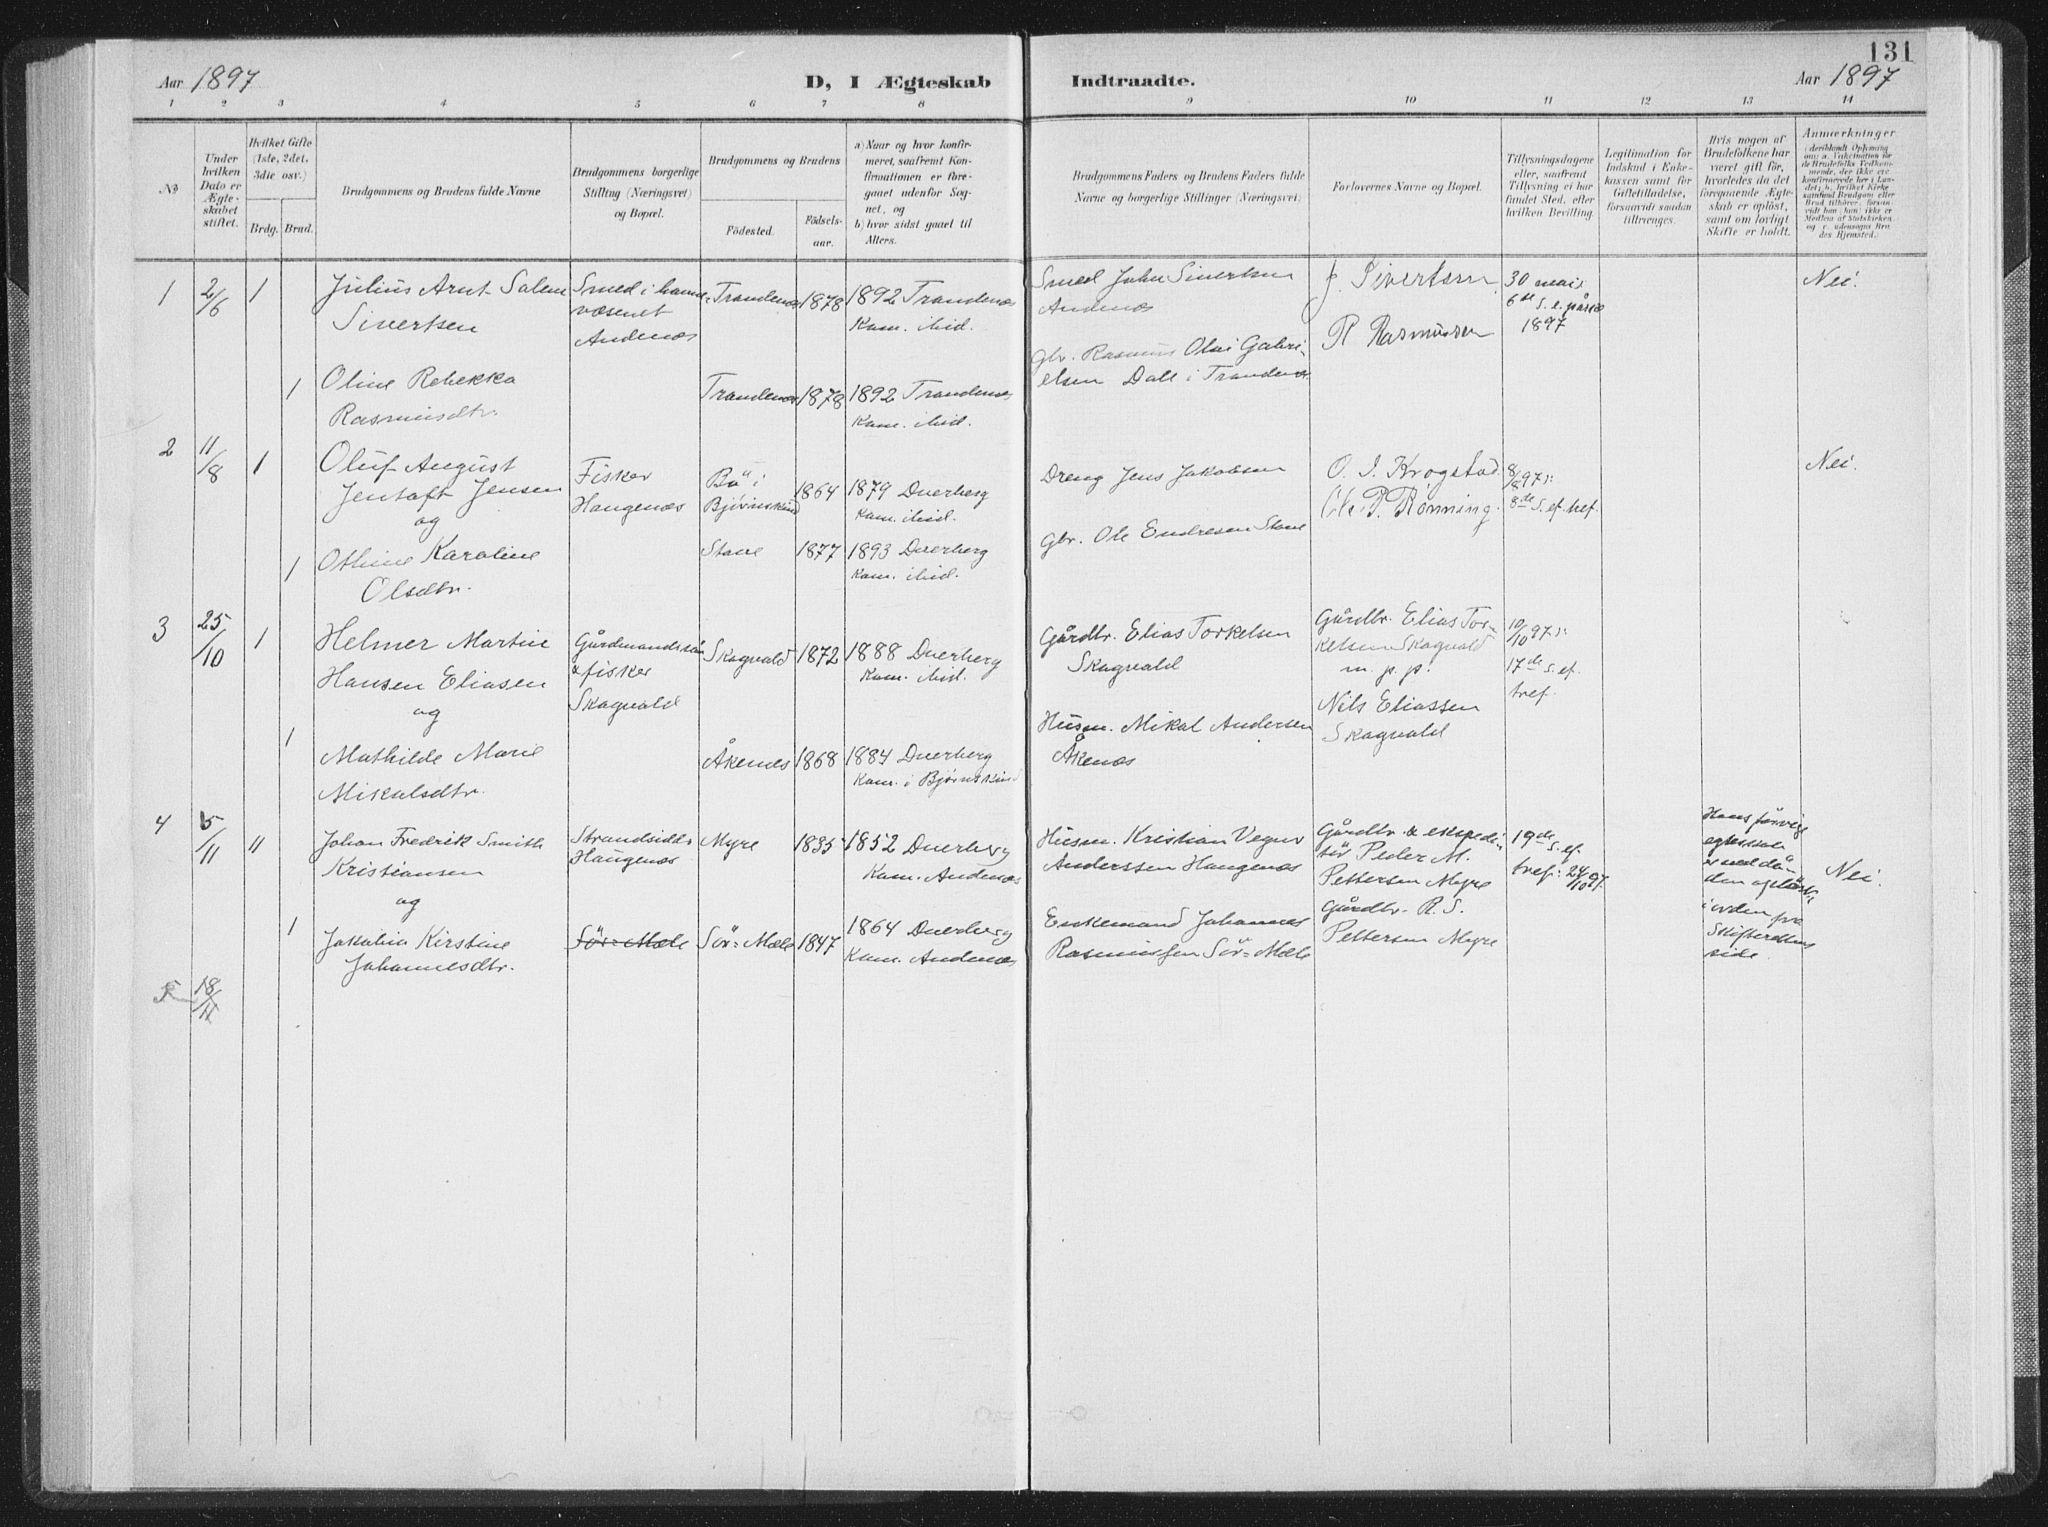 SAT, Ministerialprotokoller, klokkerbøker og fødselsregistre - Nordland, 897/L1400: Ministerialbok nr. 897A07, 1897-1908, s. 131